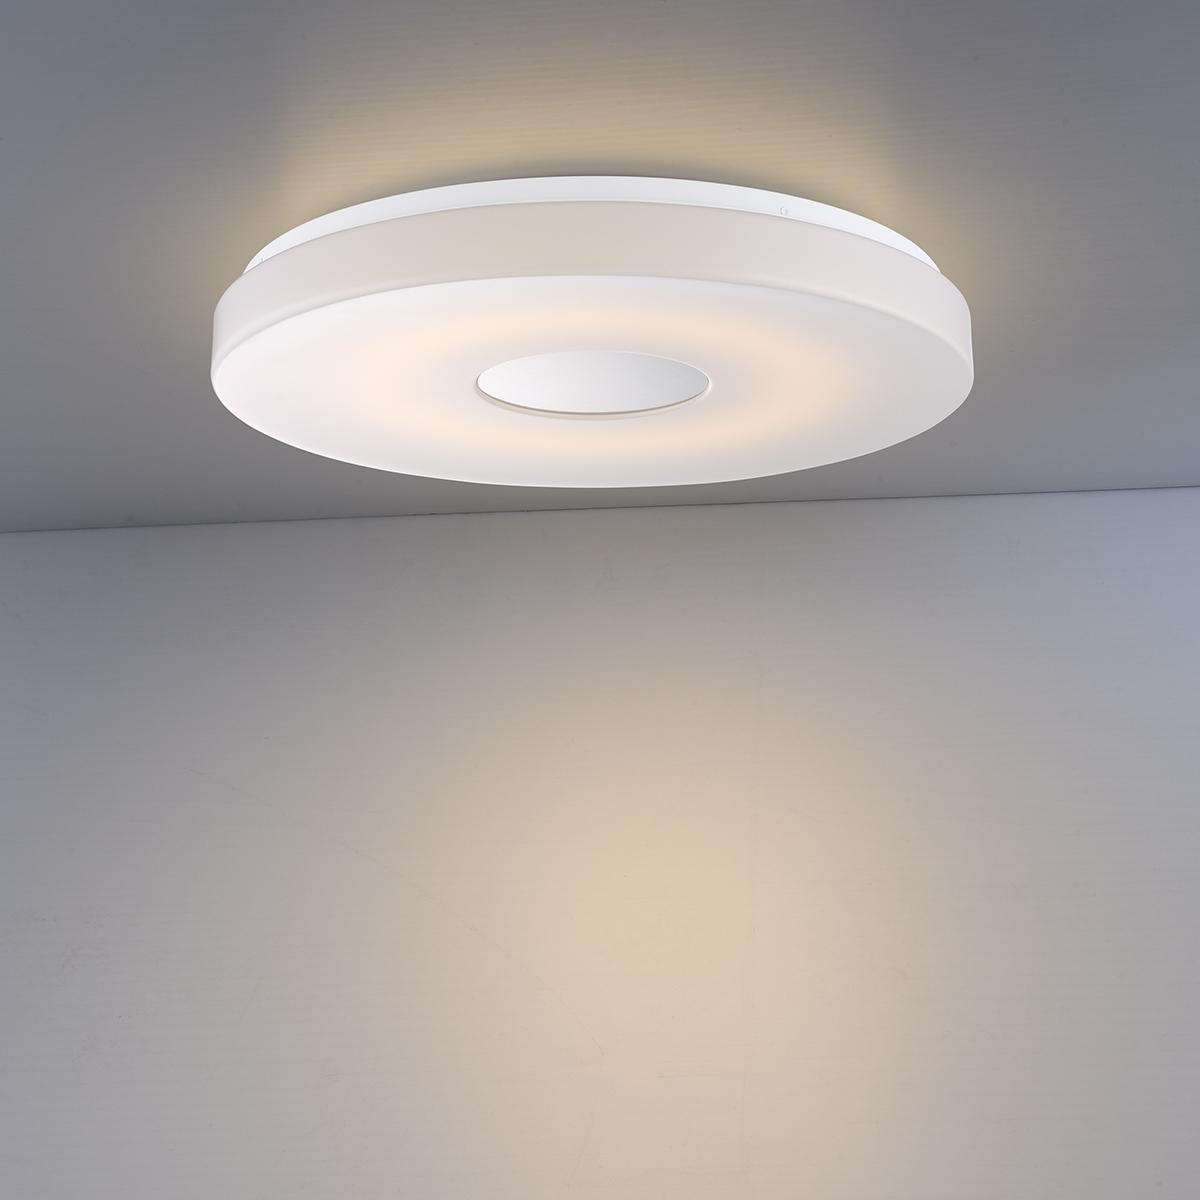 Eurofase lighting circo collection flush mount led ceiling light sold by tangyuk lighting co arubaitofo Gallery